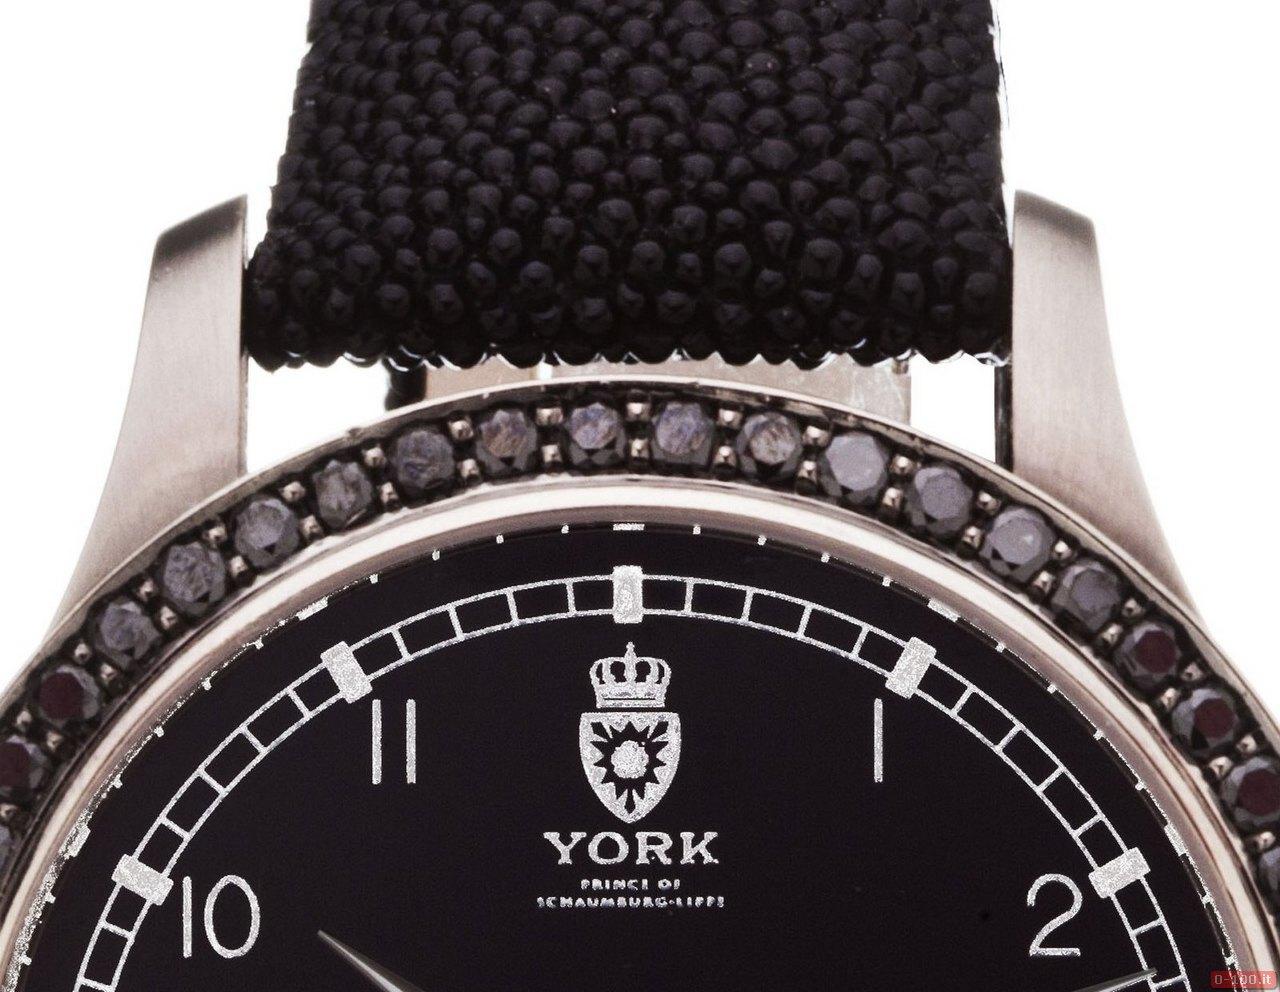 anteprima-baselworld-2013-york-royal-black-caviar_0-100 4